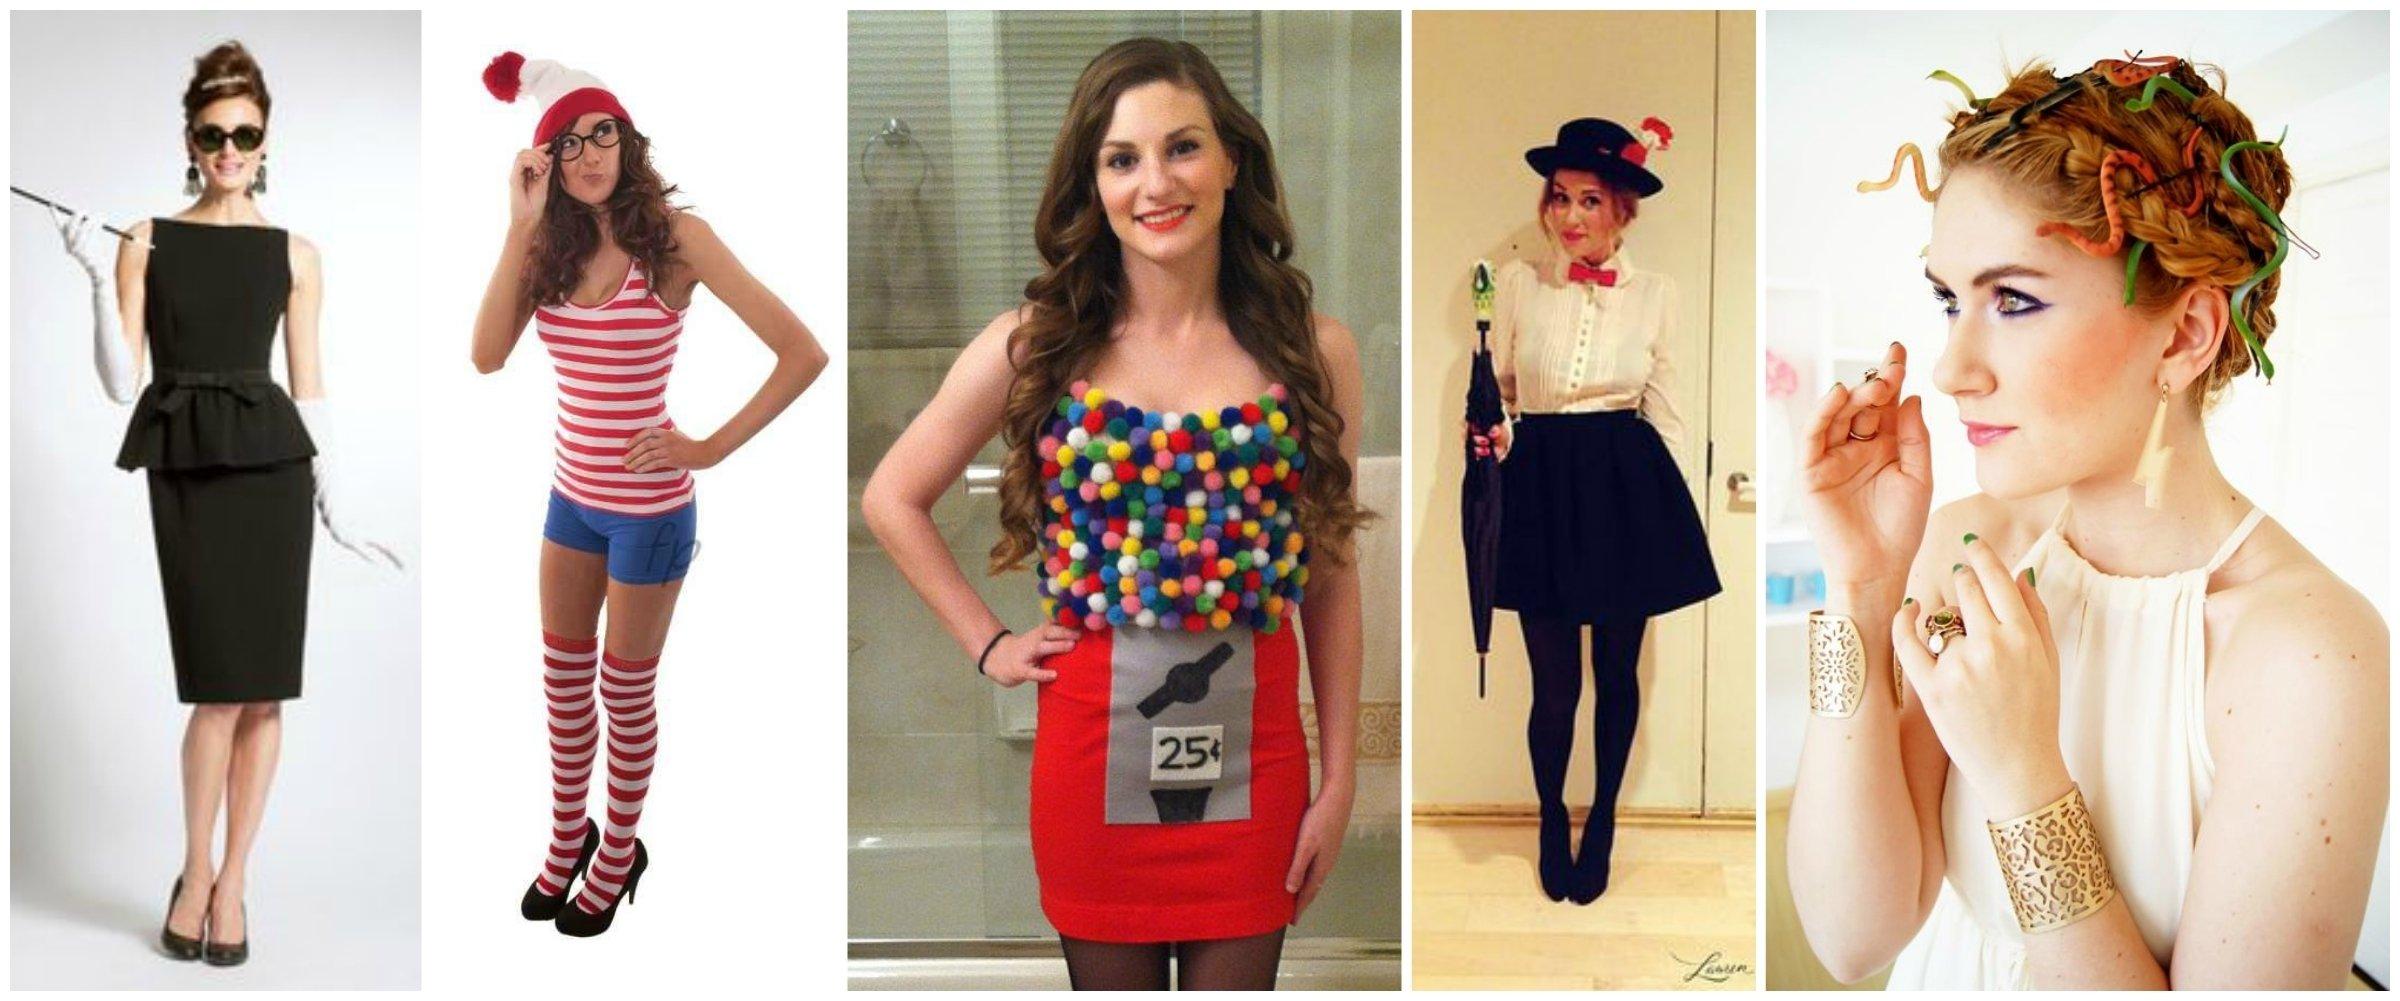 10 Cute Diy Women Halloween Costume Ideas 61 costume ideas for best 10 group costumes ideas on pinterest work 1